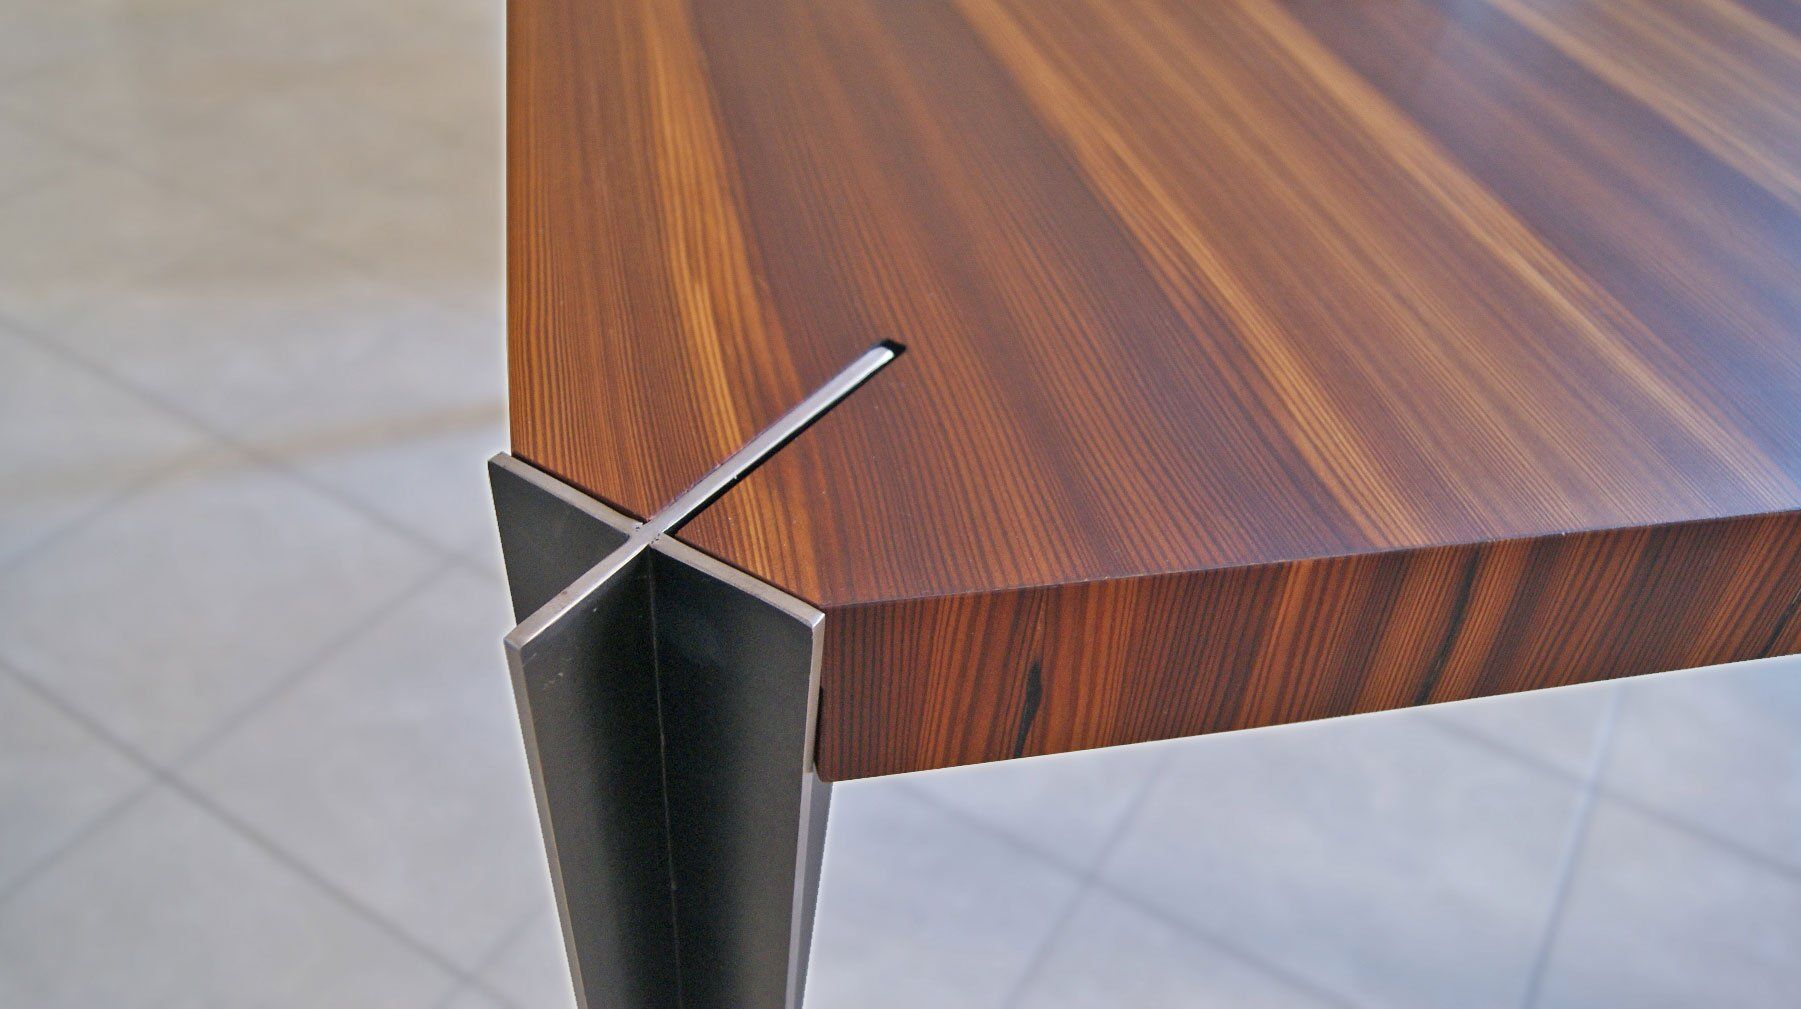 Solaris Table - ARCHITETTURA ed INTORNI